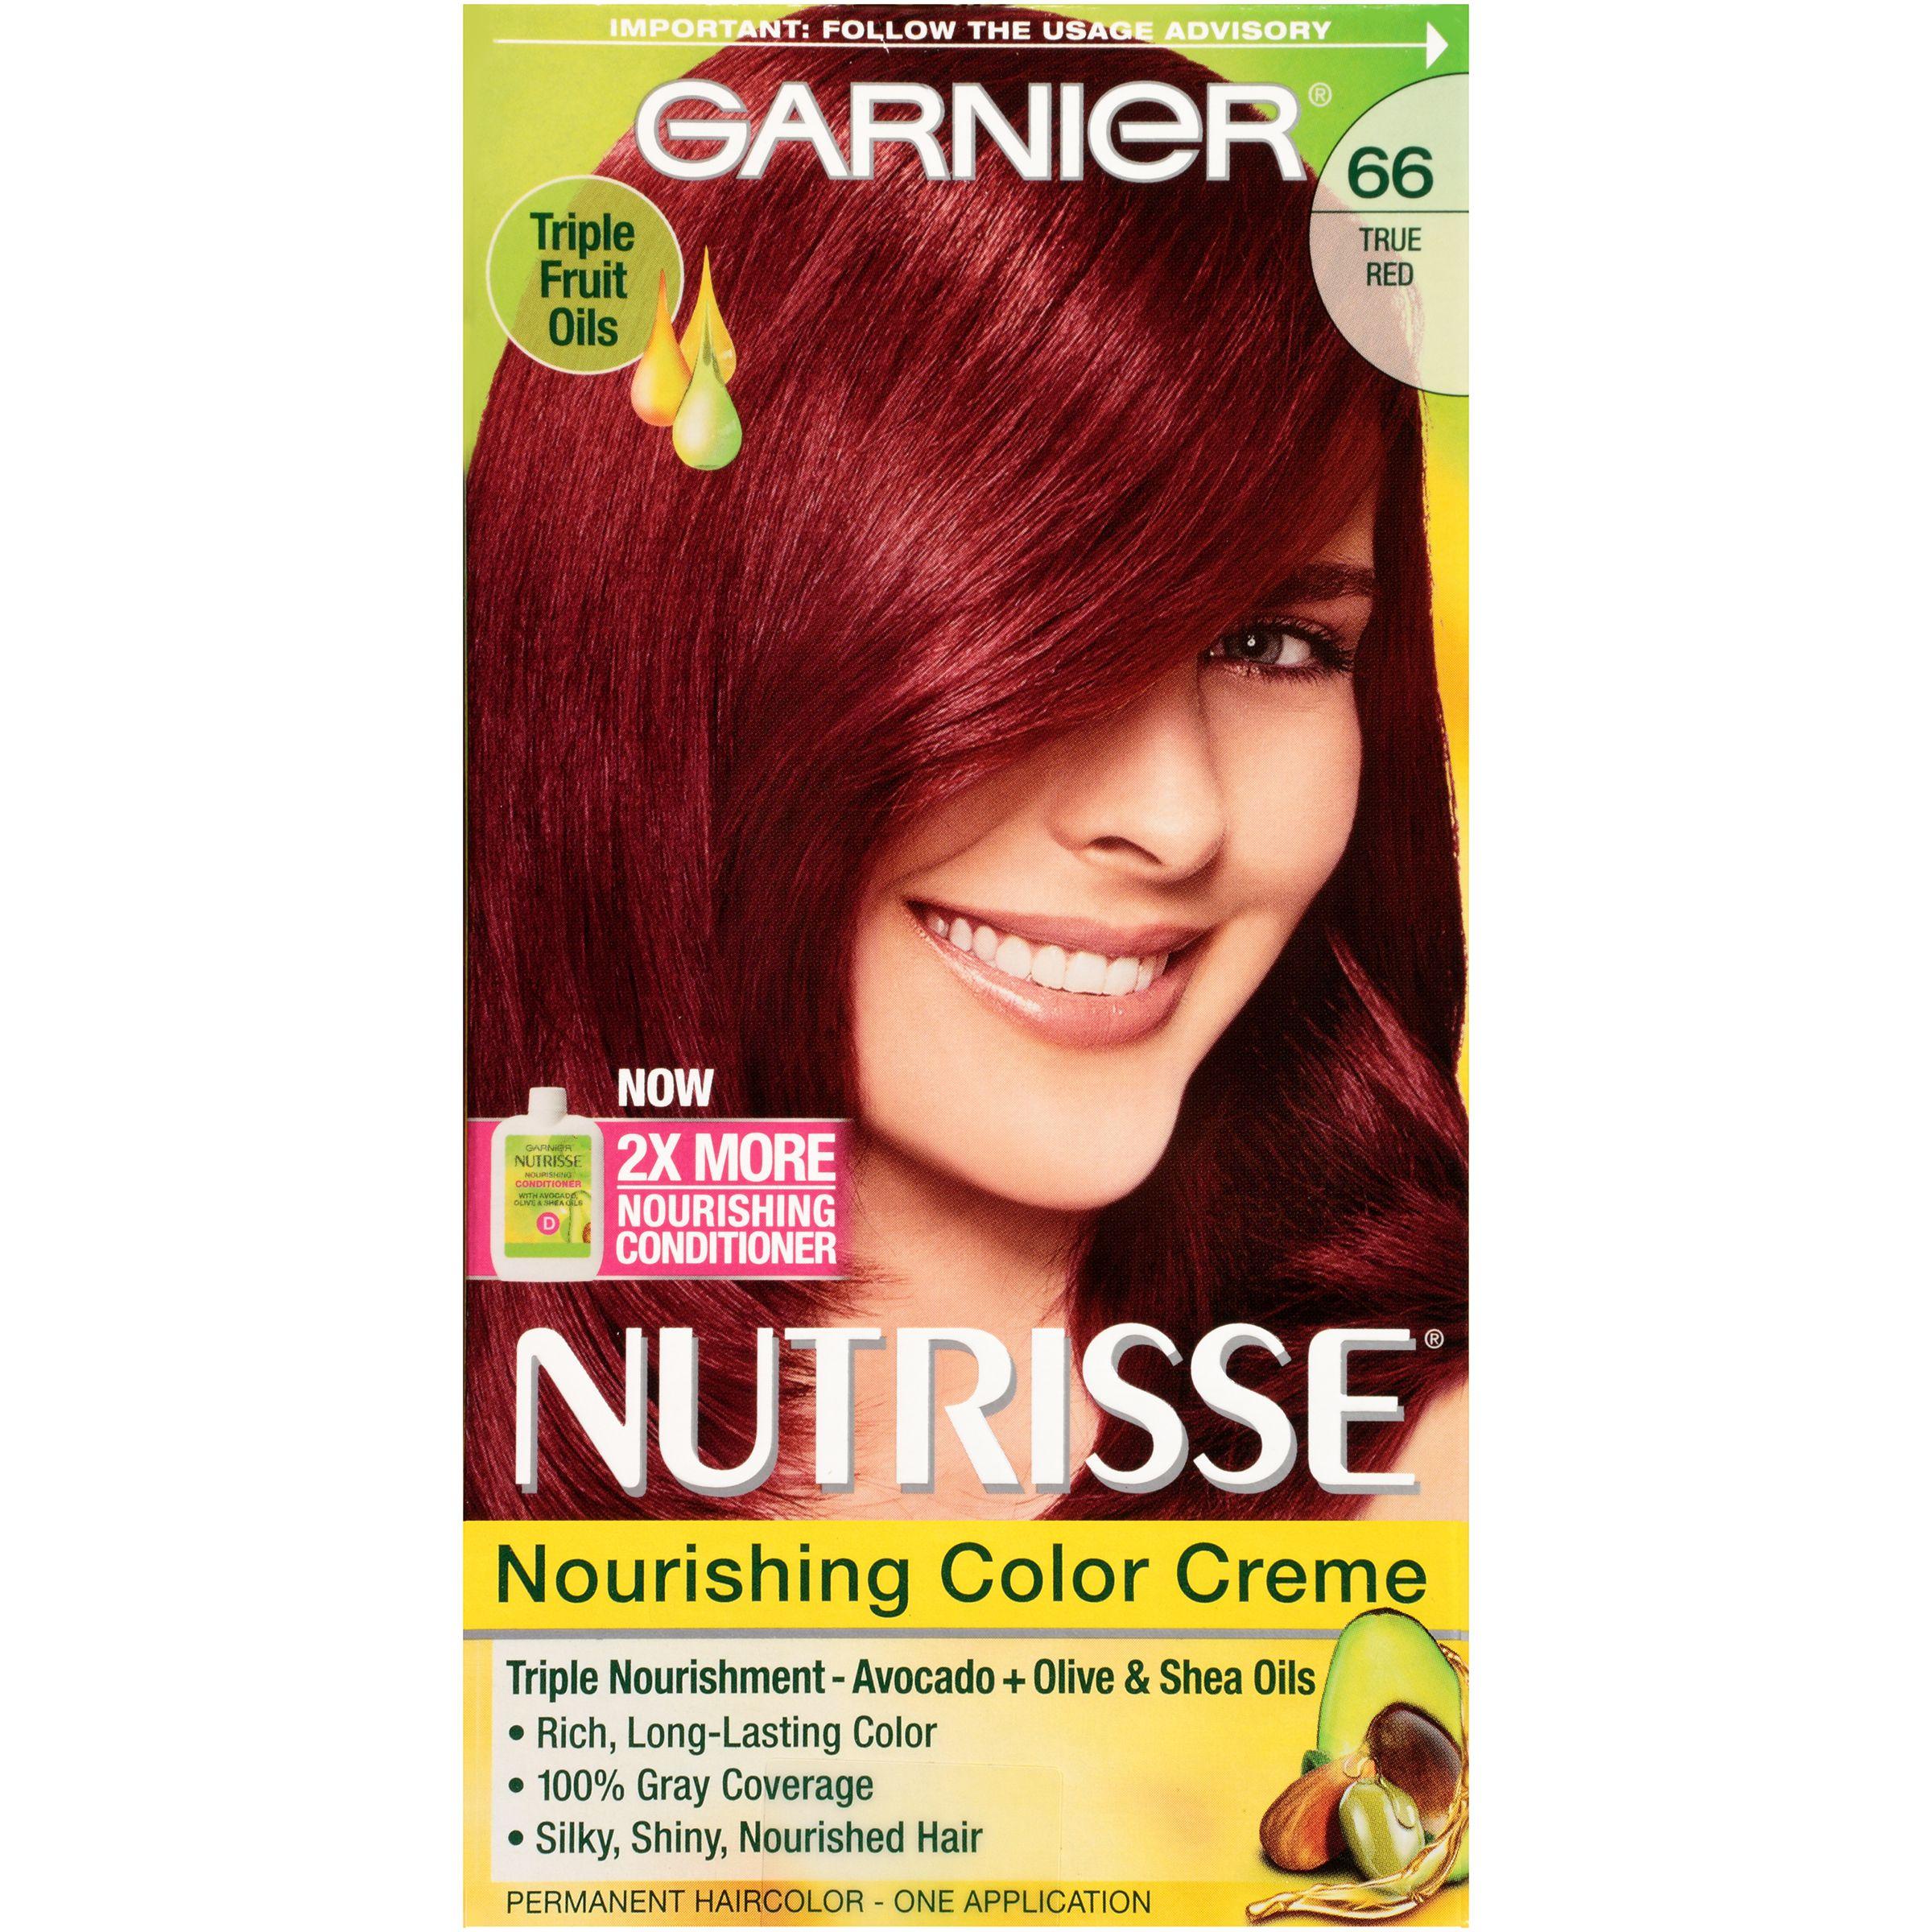 Garnier Nutrisse Nourishing Color Creme Gray With Images At